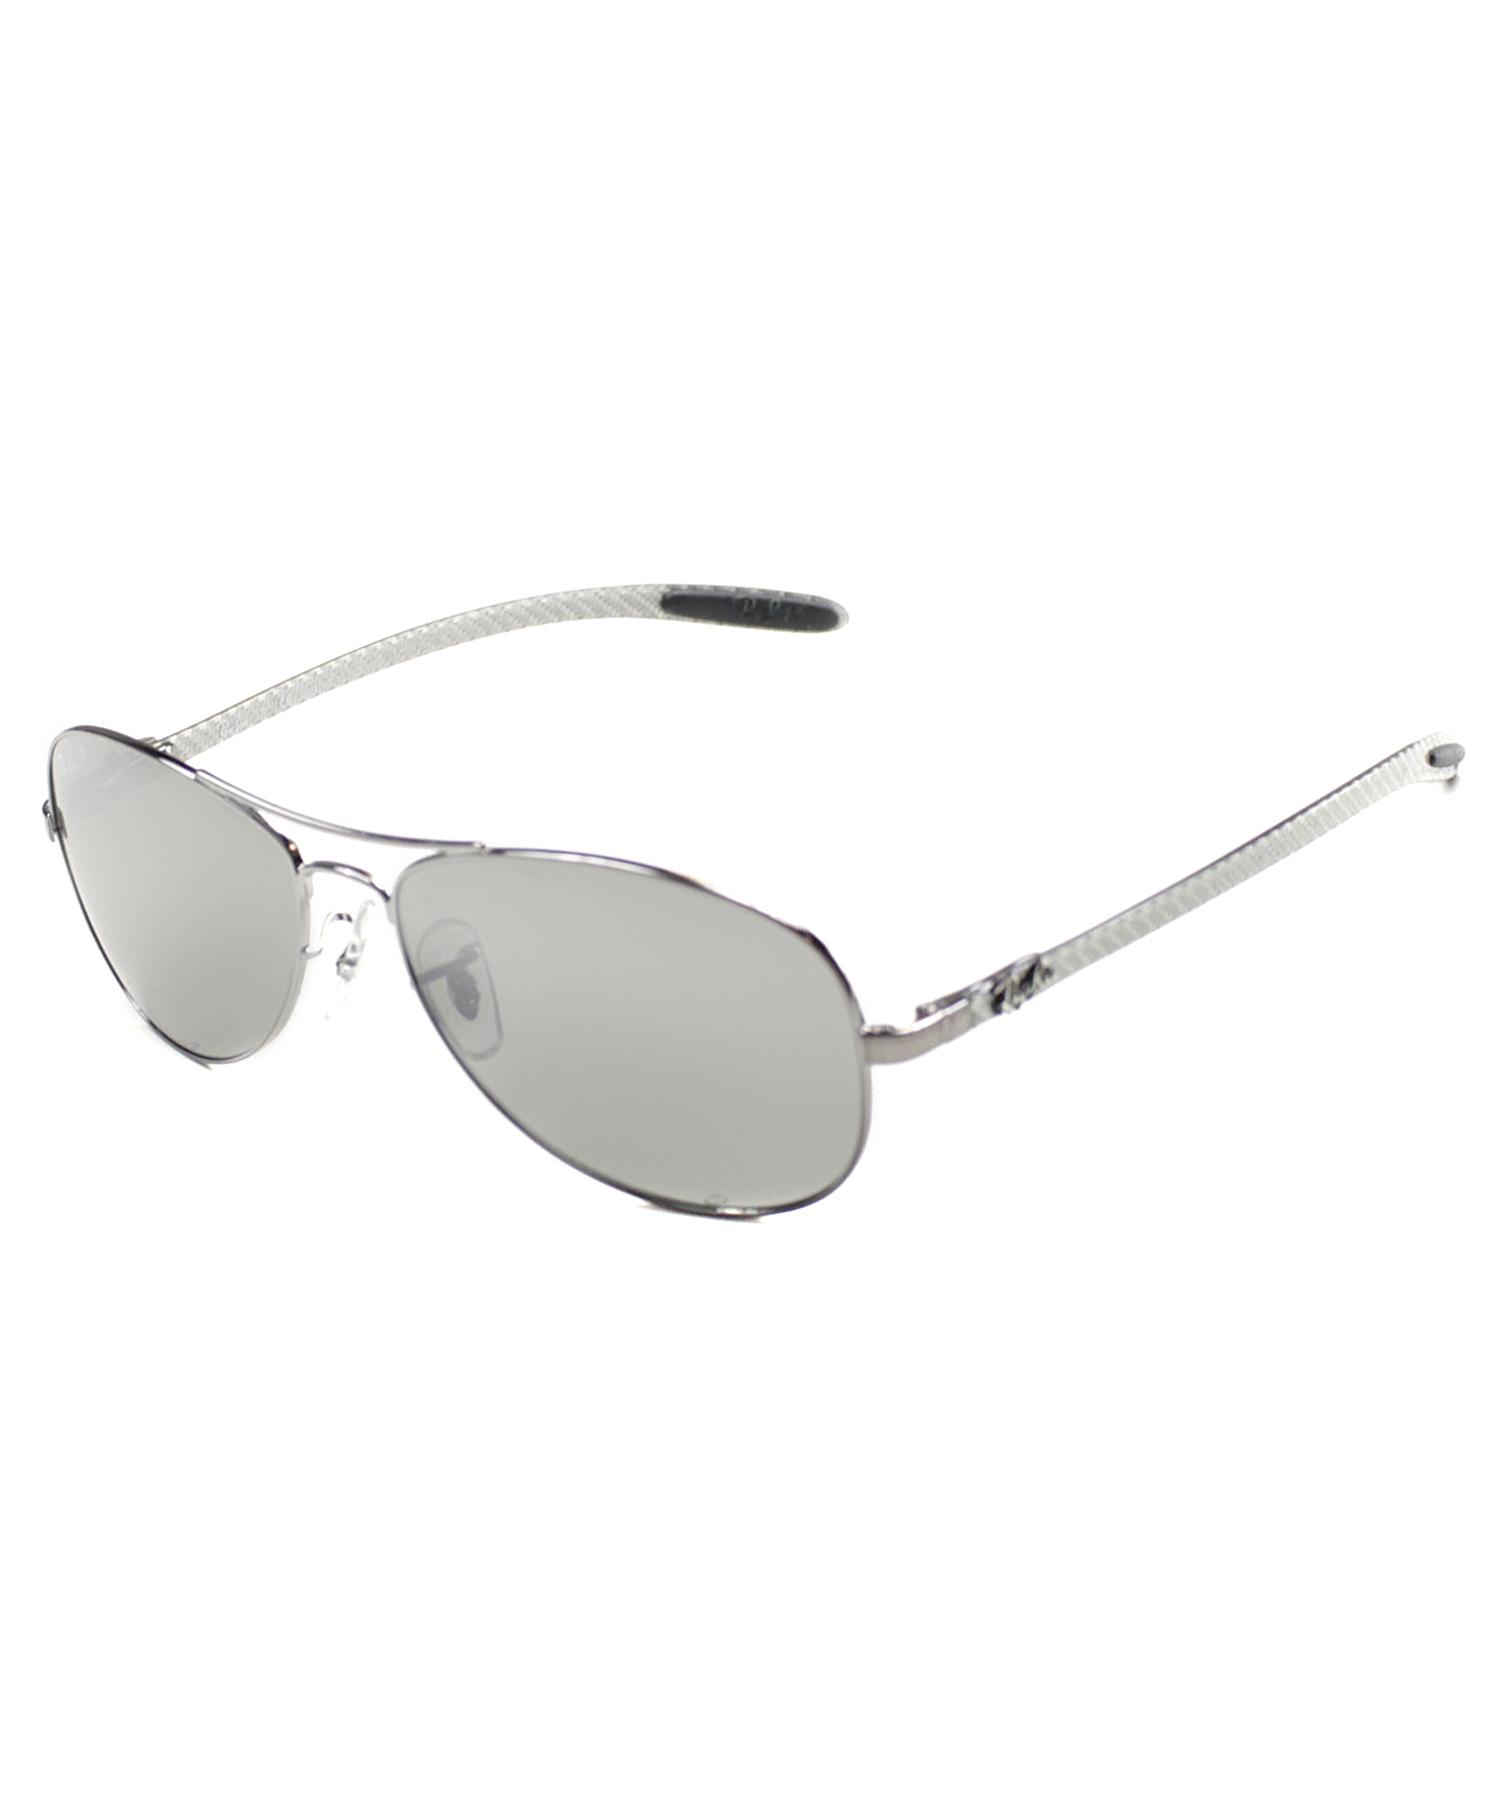 91f1853653 Ray-ban Carbon Fiber Cockpit Aviator Metal Sunglasses in Metallic (silver)  - Save